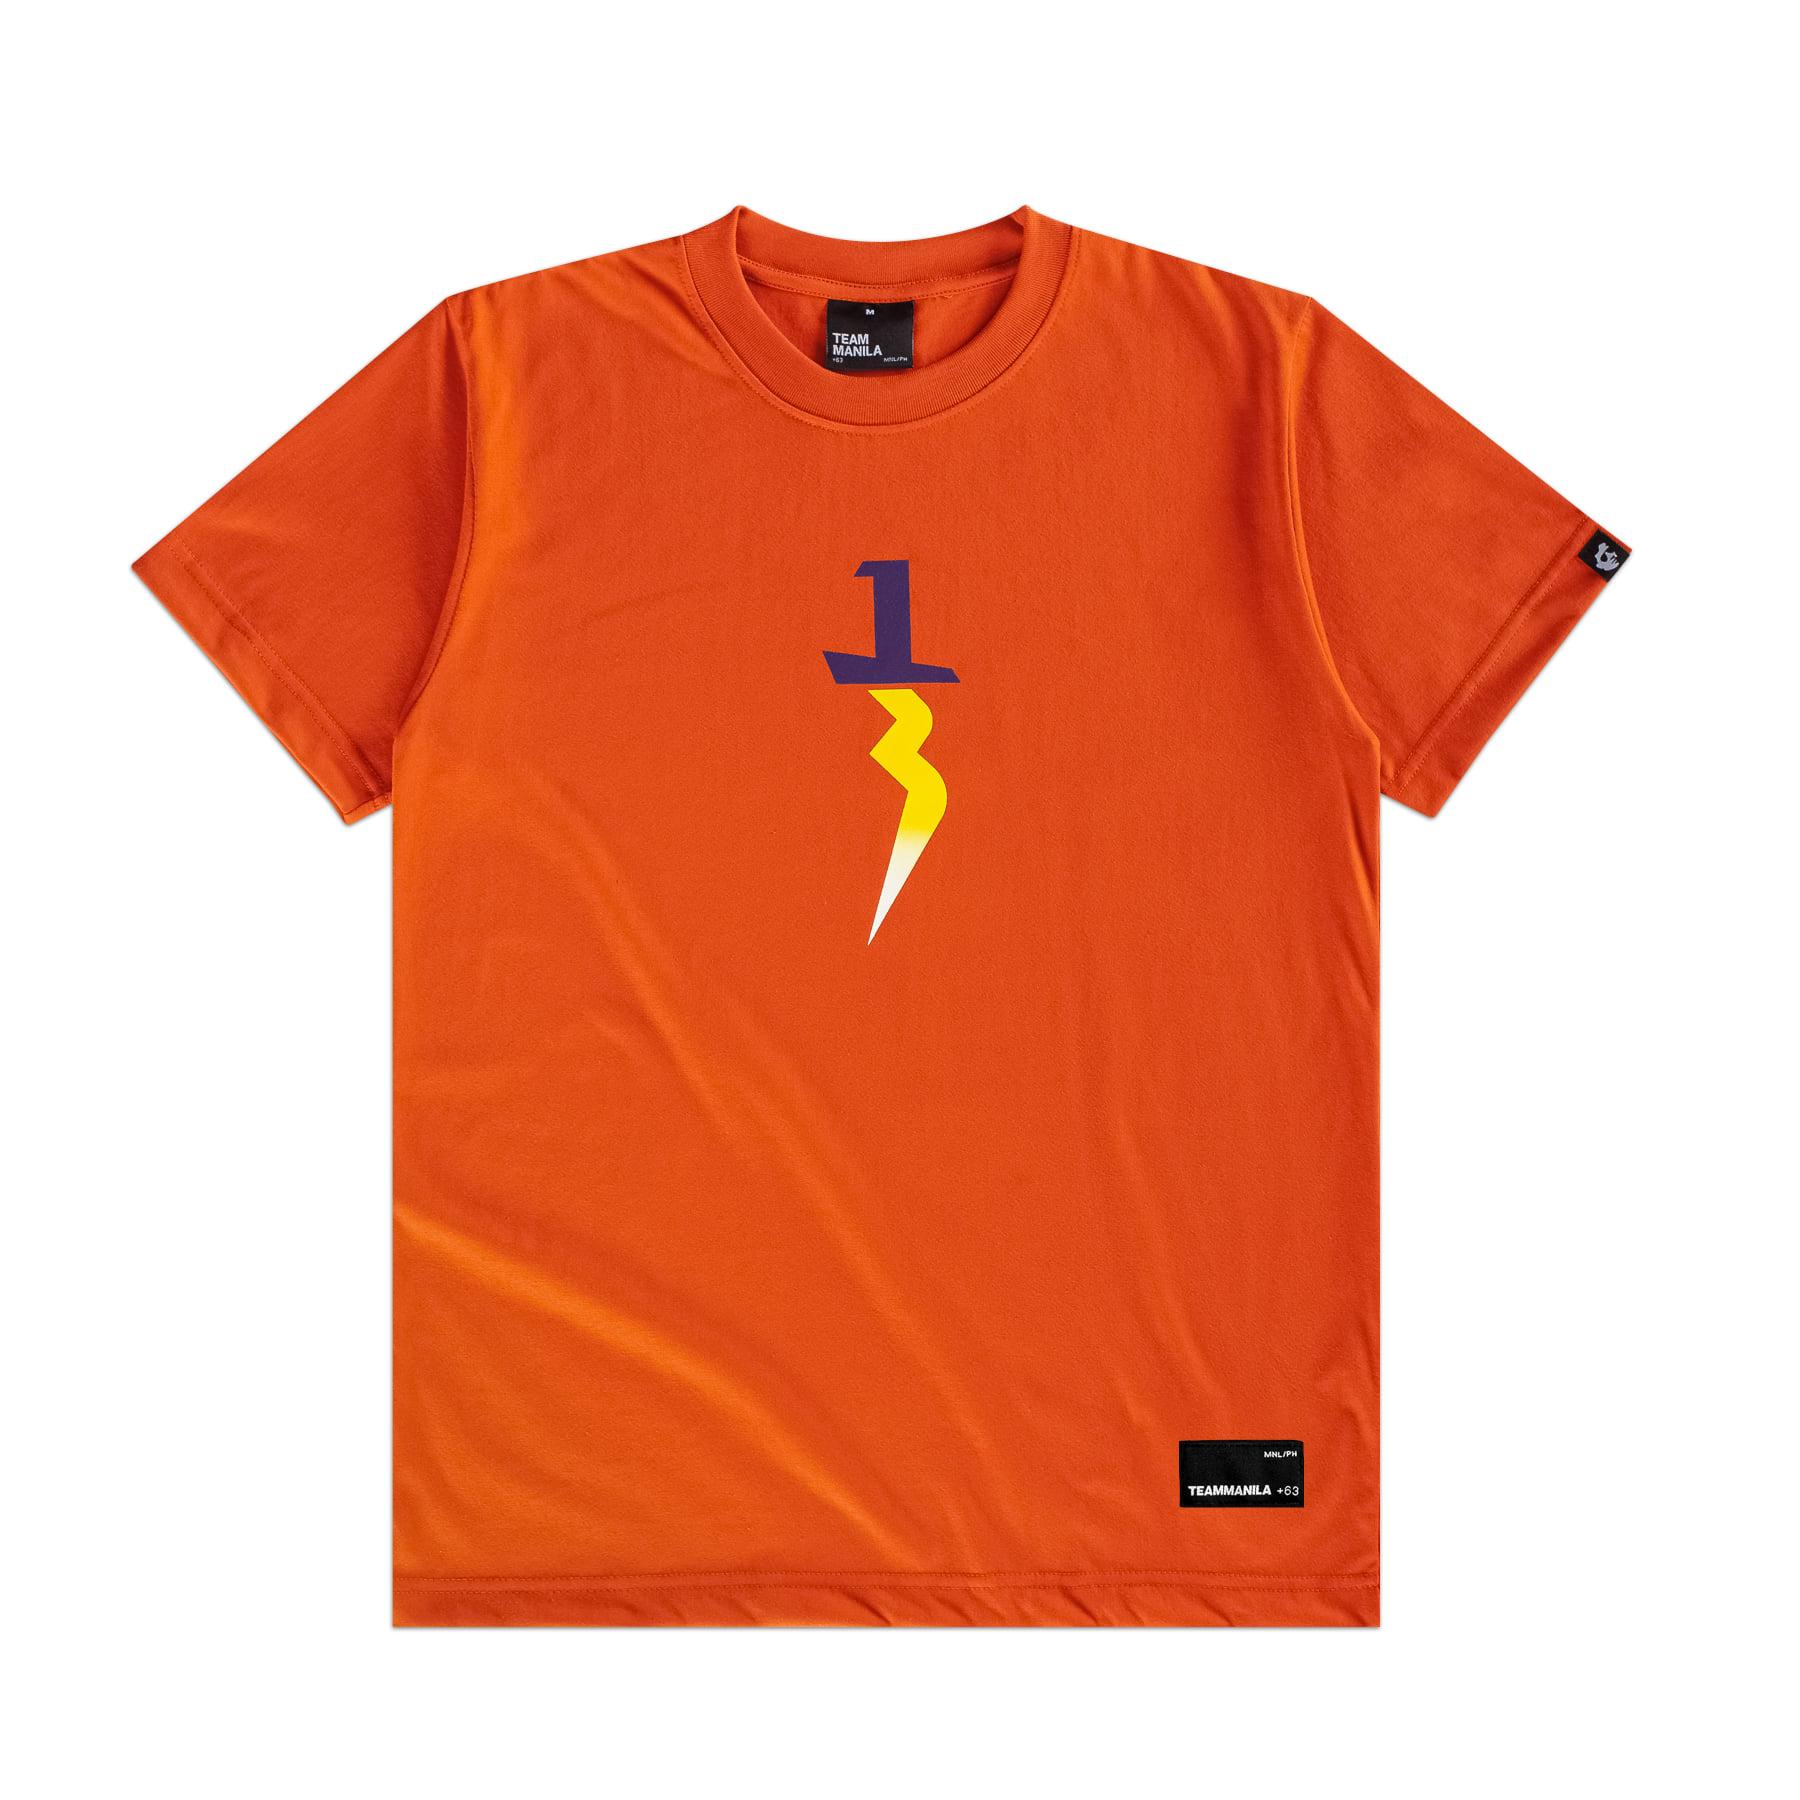 Trese inspired shirt by Dan Matutina x Team Manila collab (FRONT)